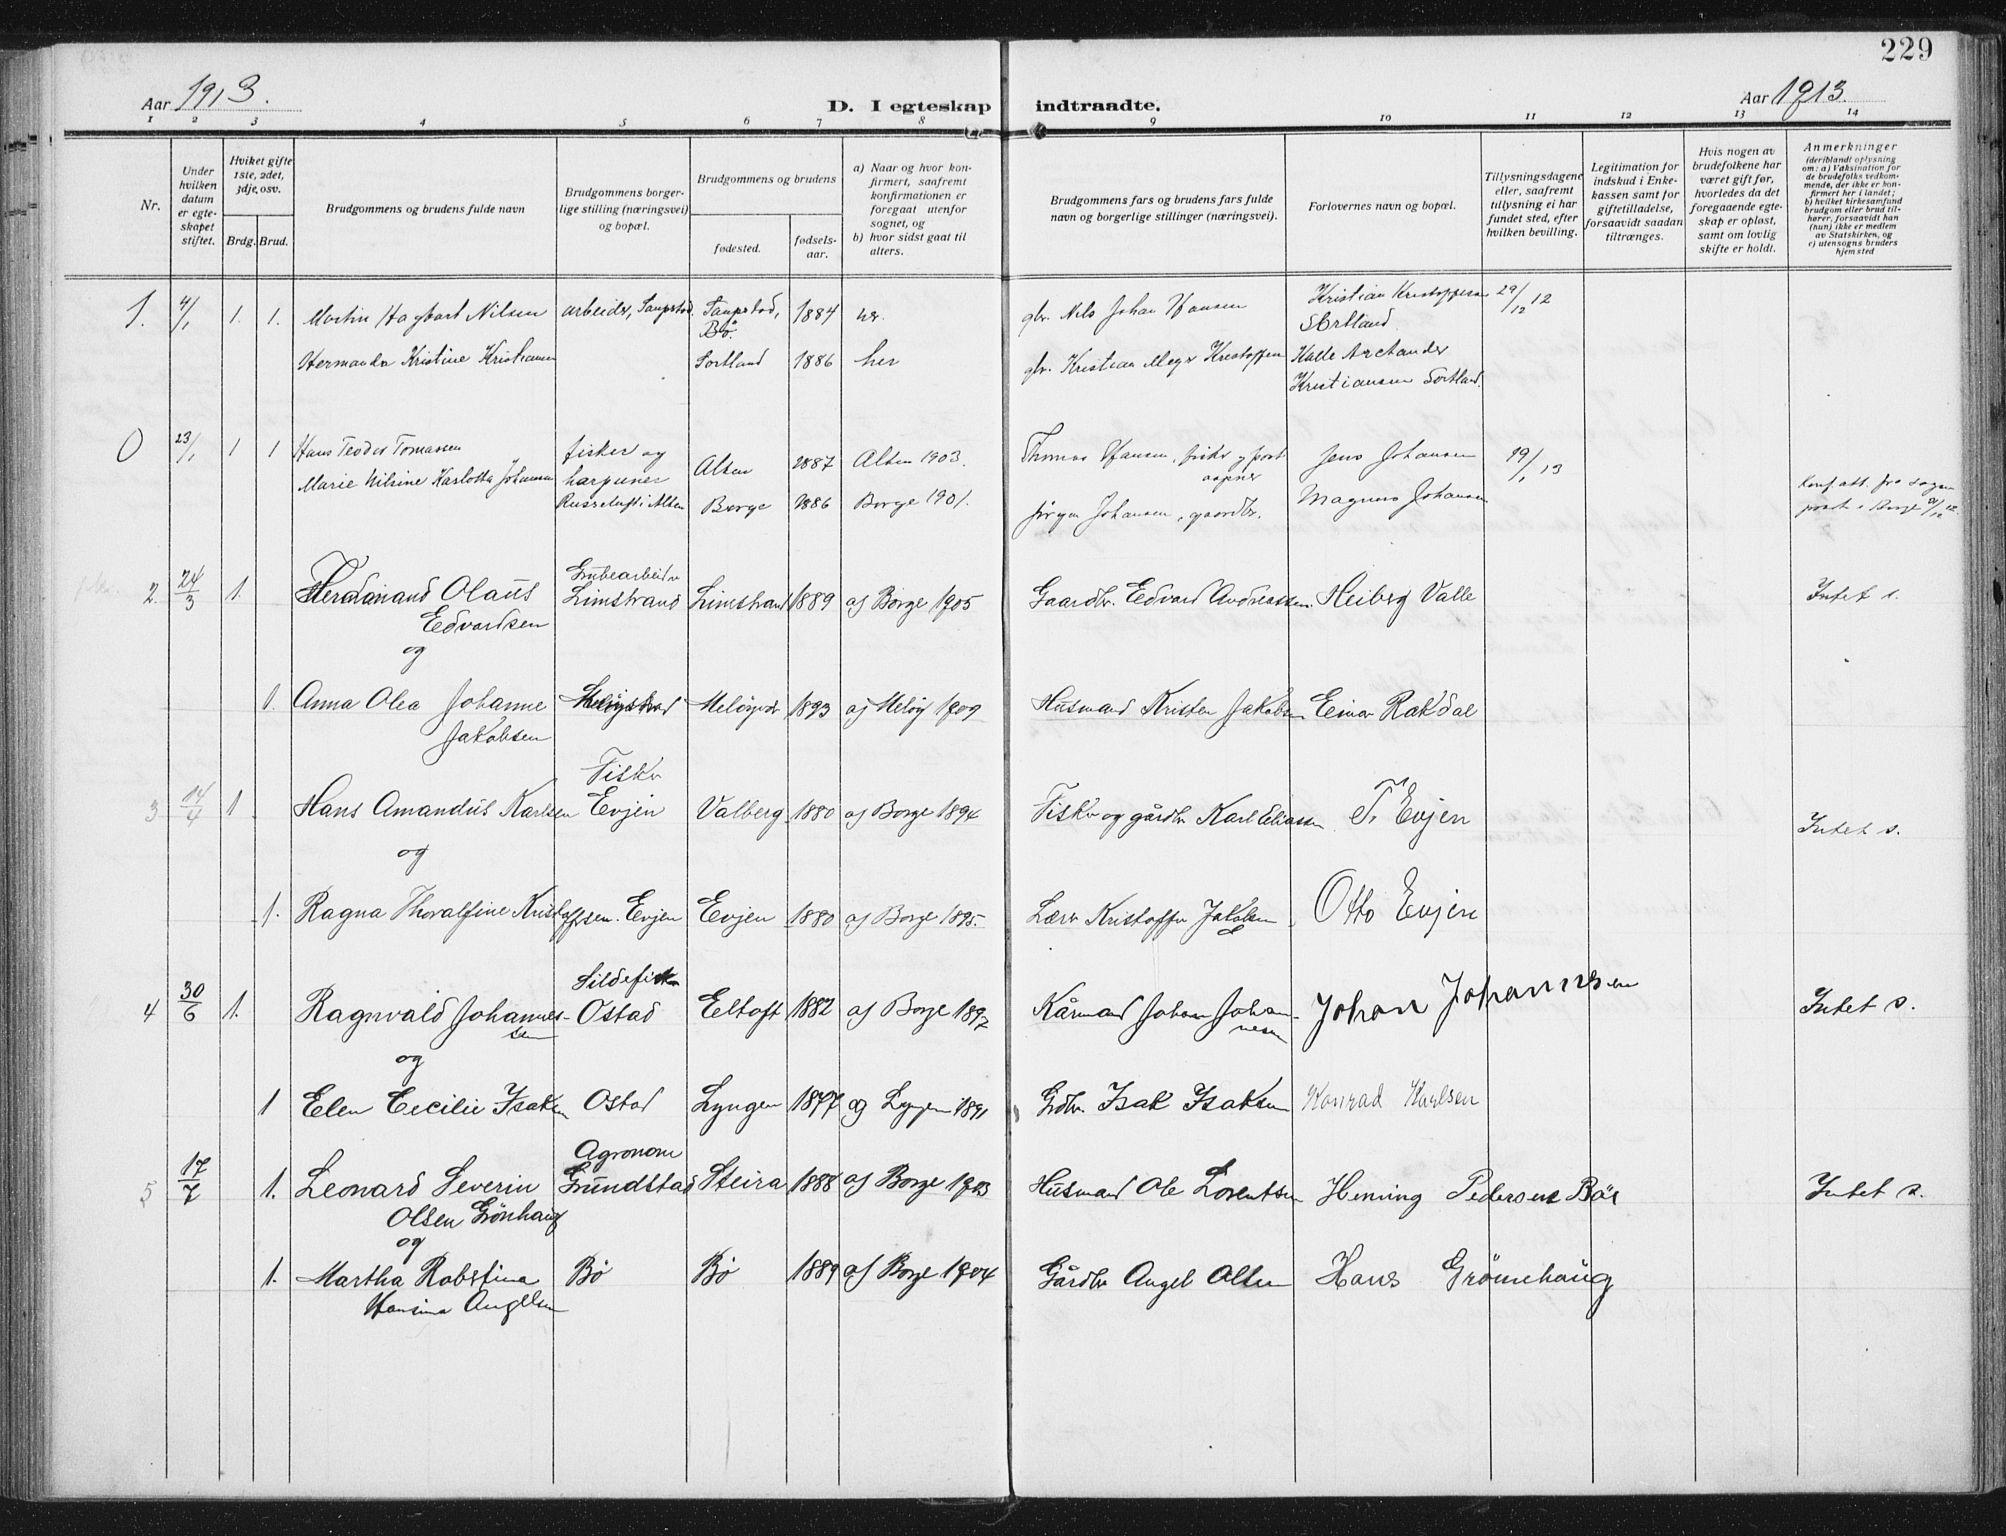 SAT, Ministerialprotokoller, klokkerbøker og fødselsregistre - Nordland, 880/L1135: Ministerialbok nr. 880A09, 1908-1919, s. 229